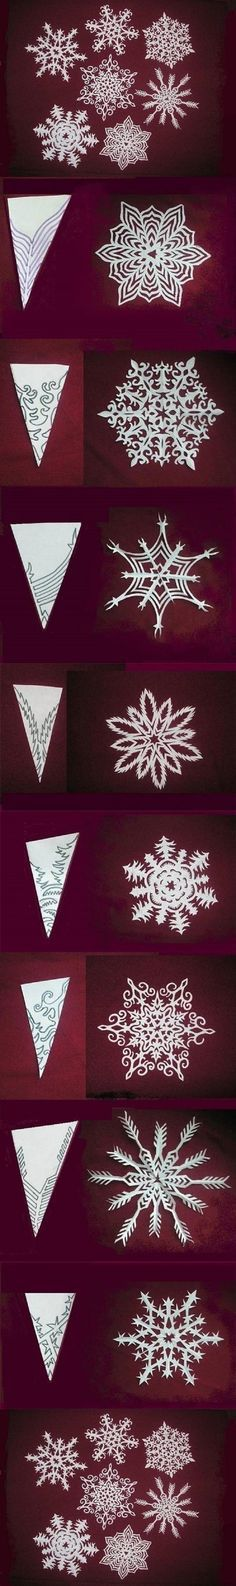 Wonderful DIY Paper Snowflakes With Pattern - 16 Winter Wonderland DIY Paper Decorations